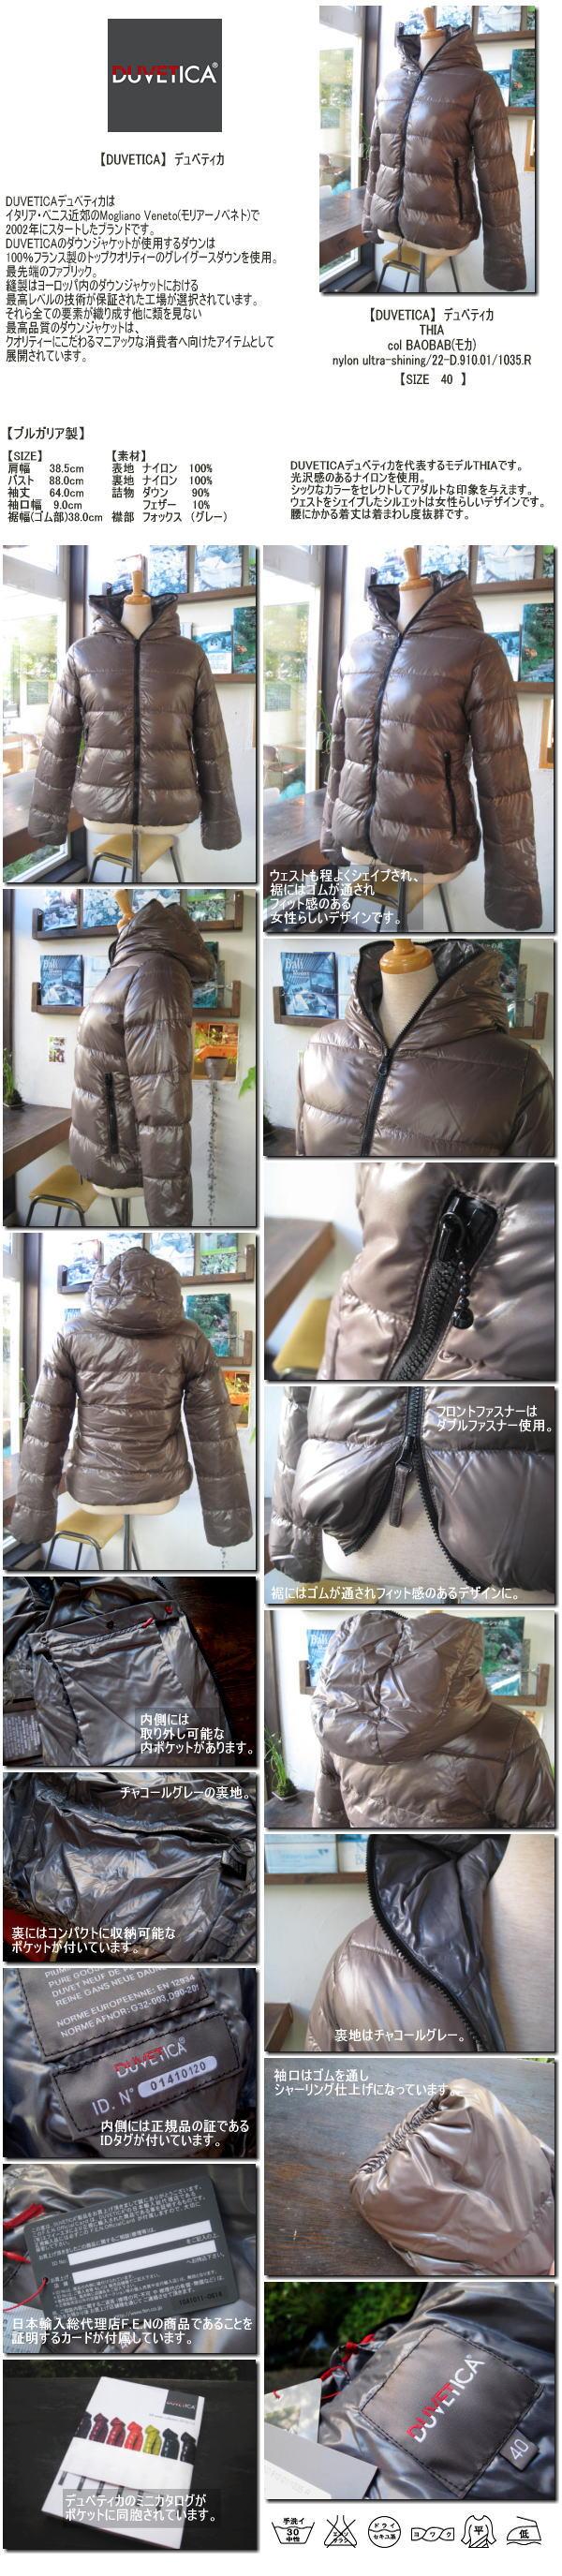 【DUVETICA】 デュベティカ THIA nylon ultra-shining/22-D.910.01/1035.R col BAOBAB(モカ) size40